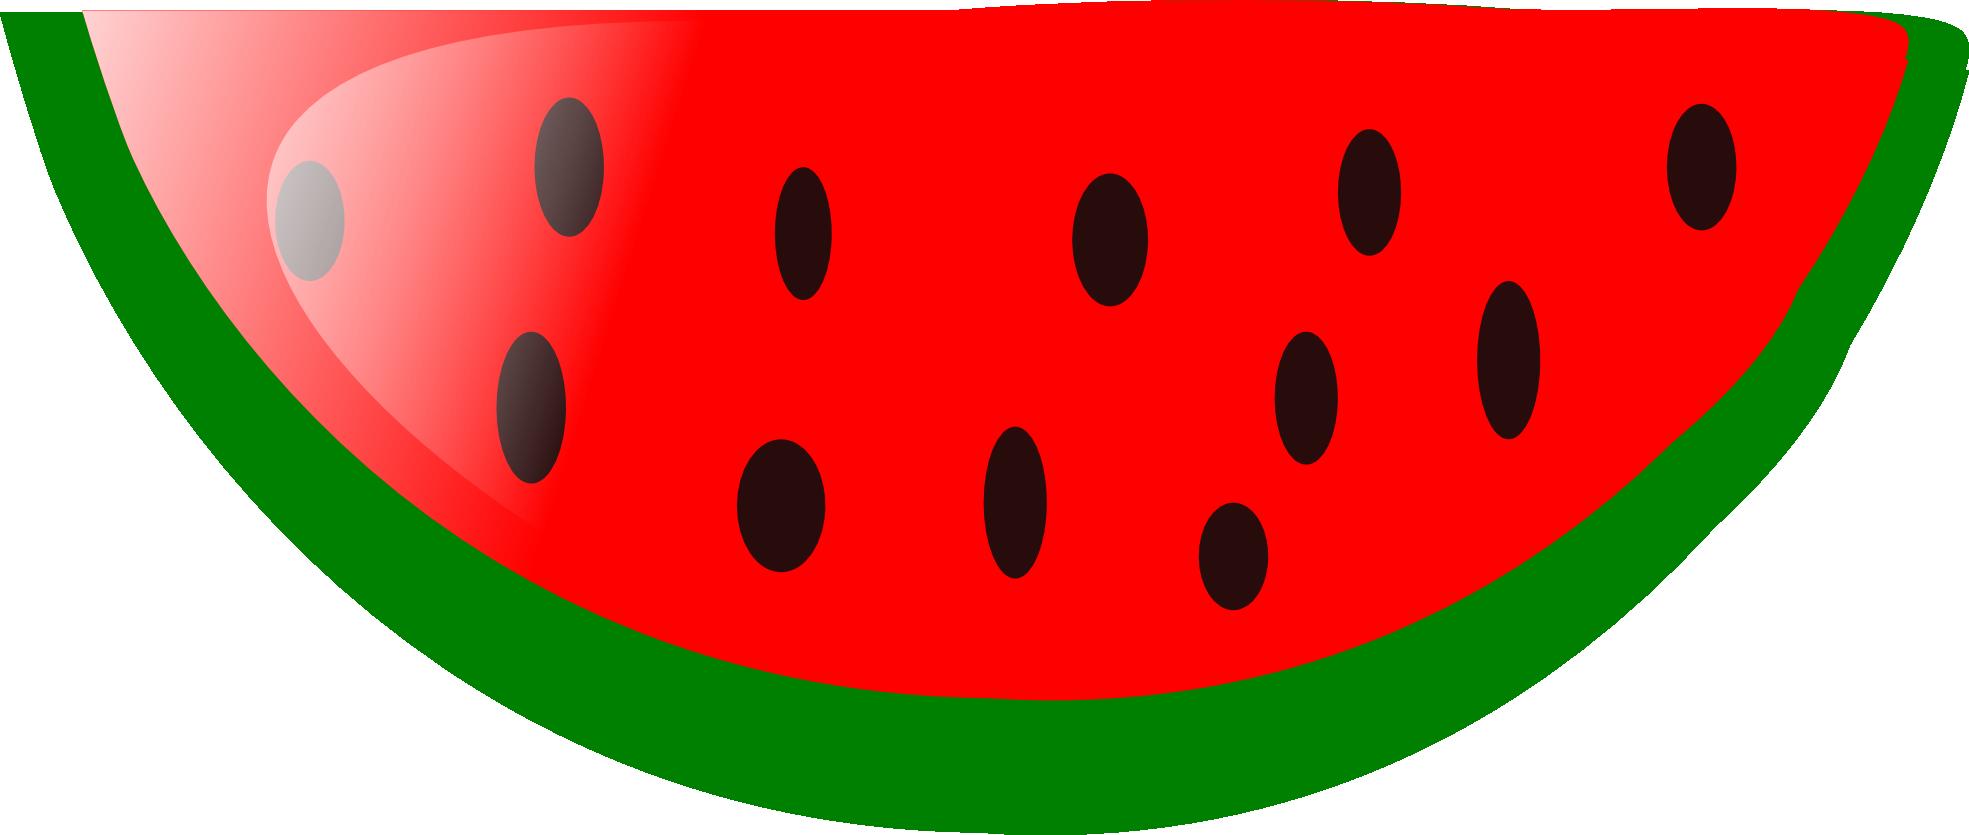 1969x835 Watermelon clip art free clipart images 2